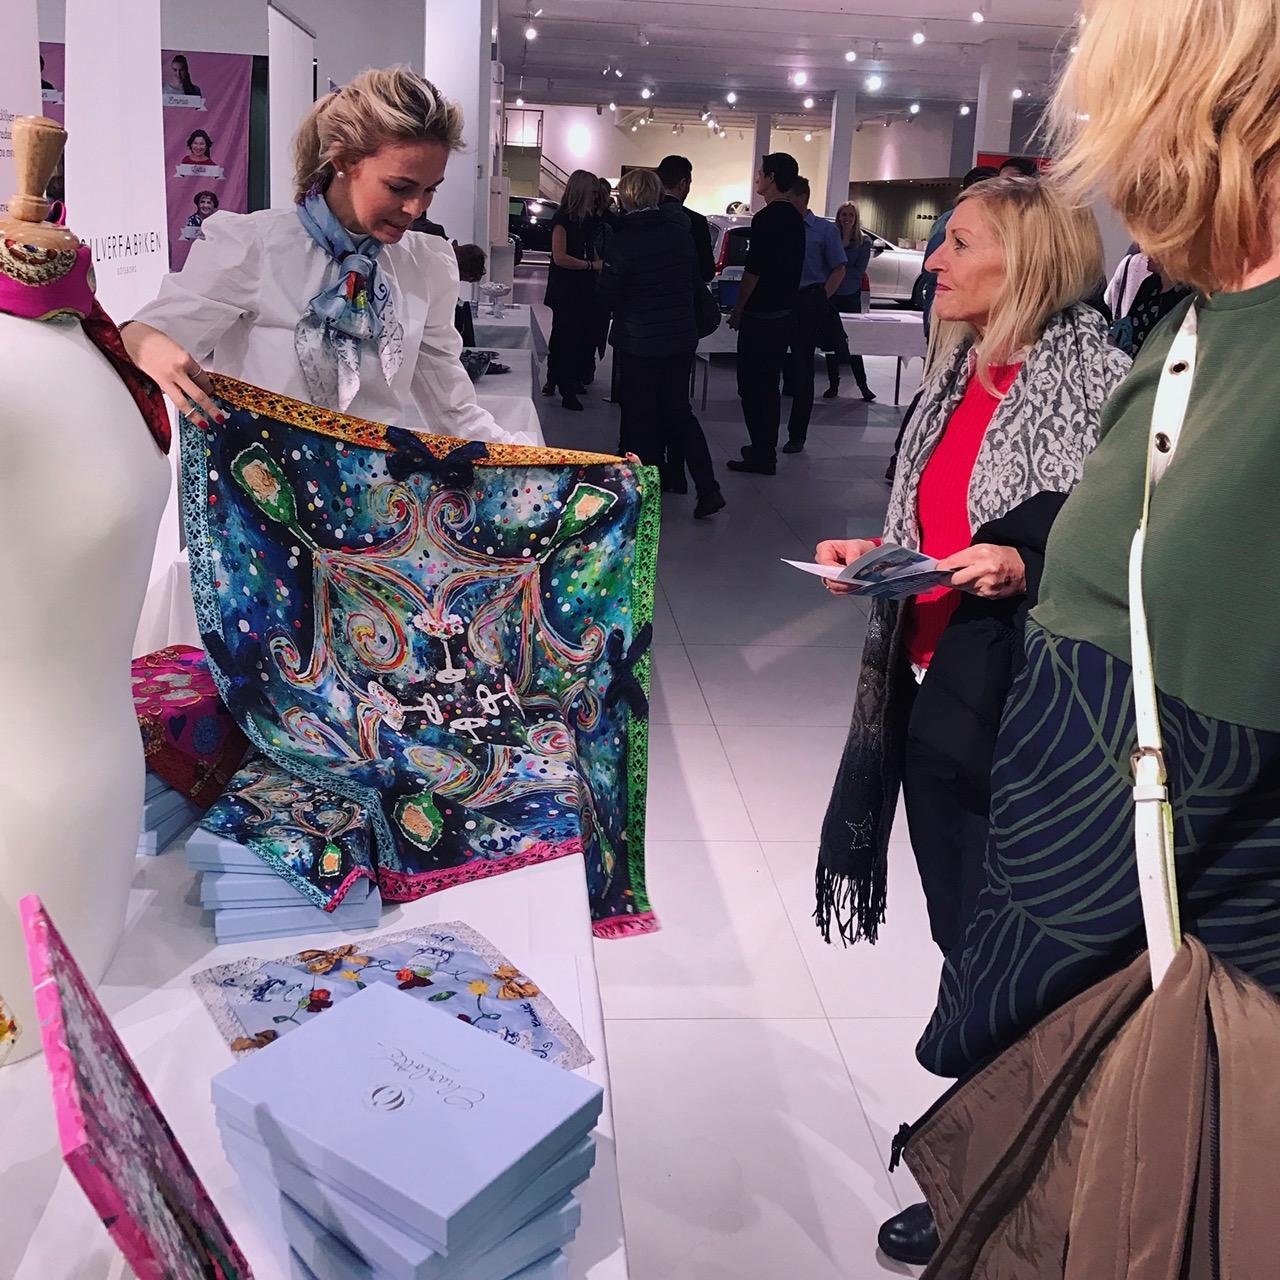 Charlotte_Olsson_Art_Design_Artist_Konst_Formgivning_silk_siden_scarf_pocketsquare_painting_sculpture_swedishart_event_charity_svenskdesign